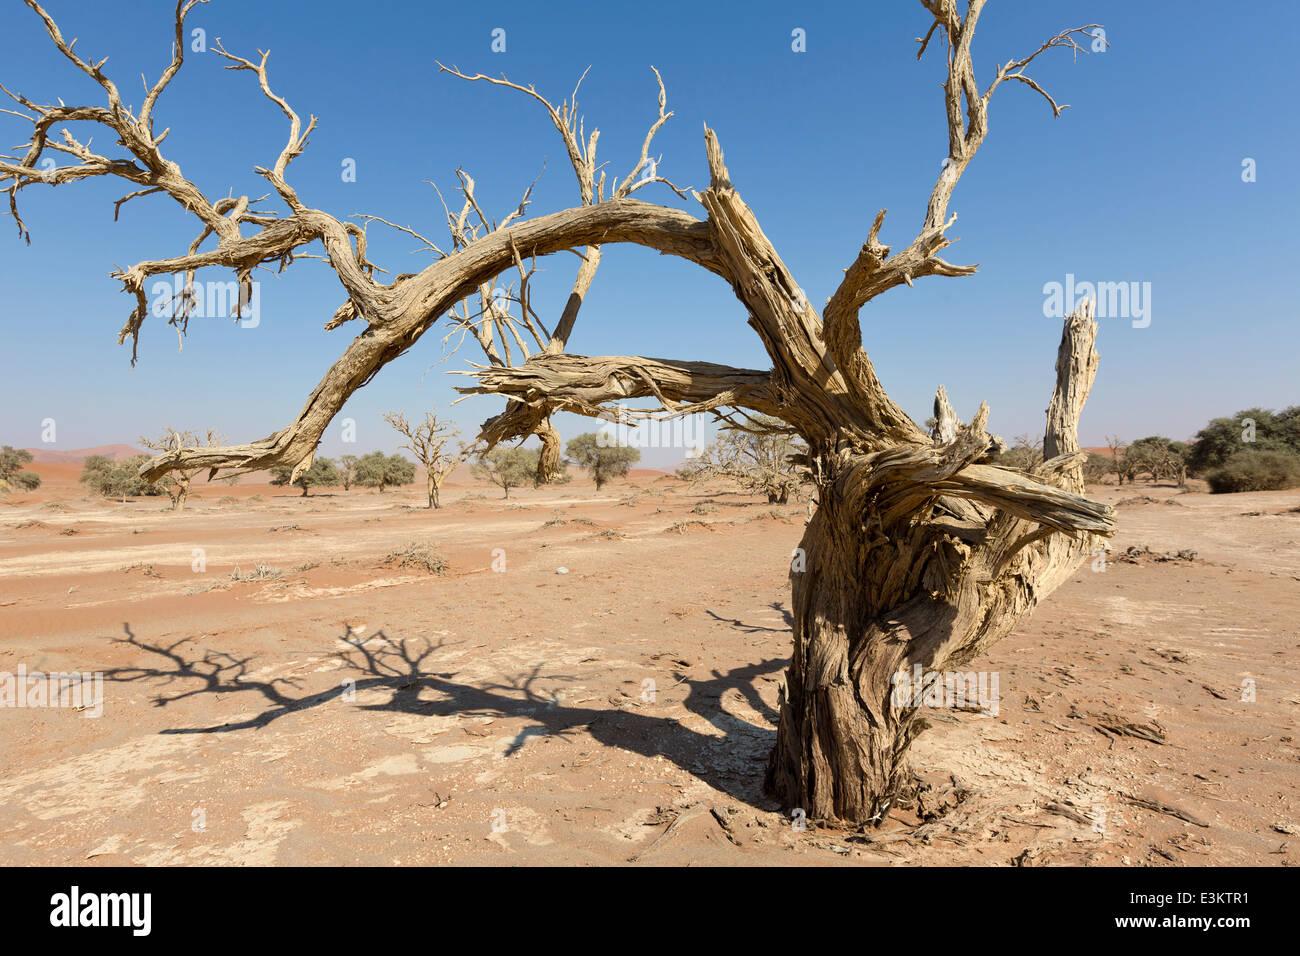 Dead tree around famous dunes in Sossusvlei, Namib-Naukluft National Park of Namibia Stock Photo